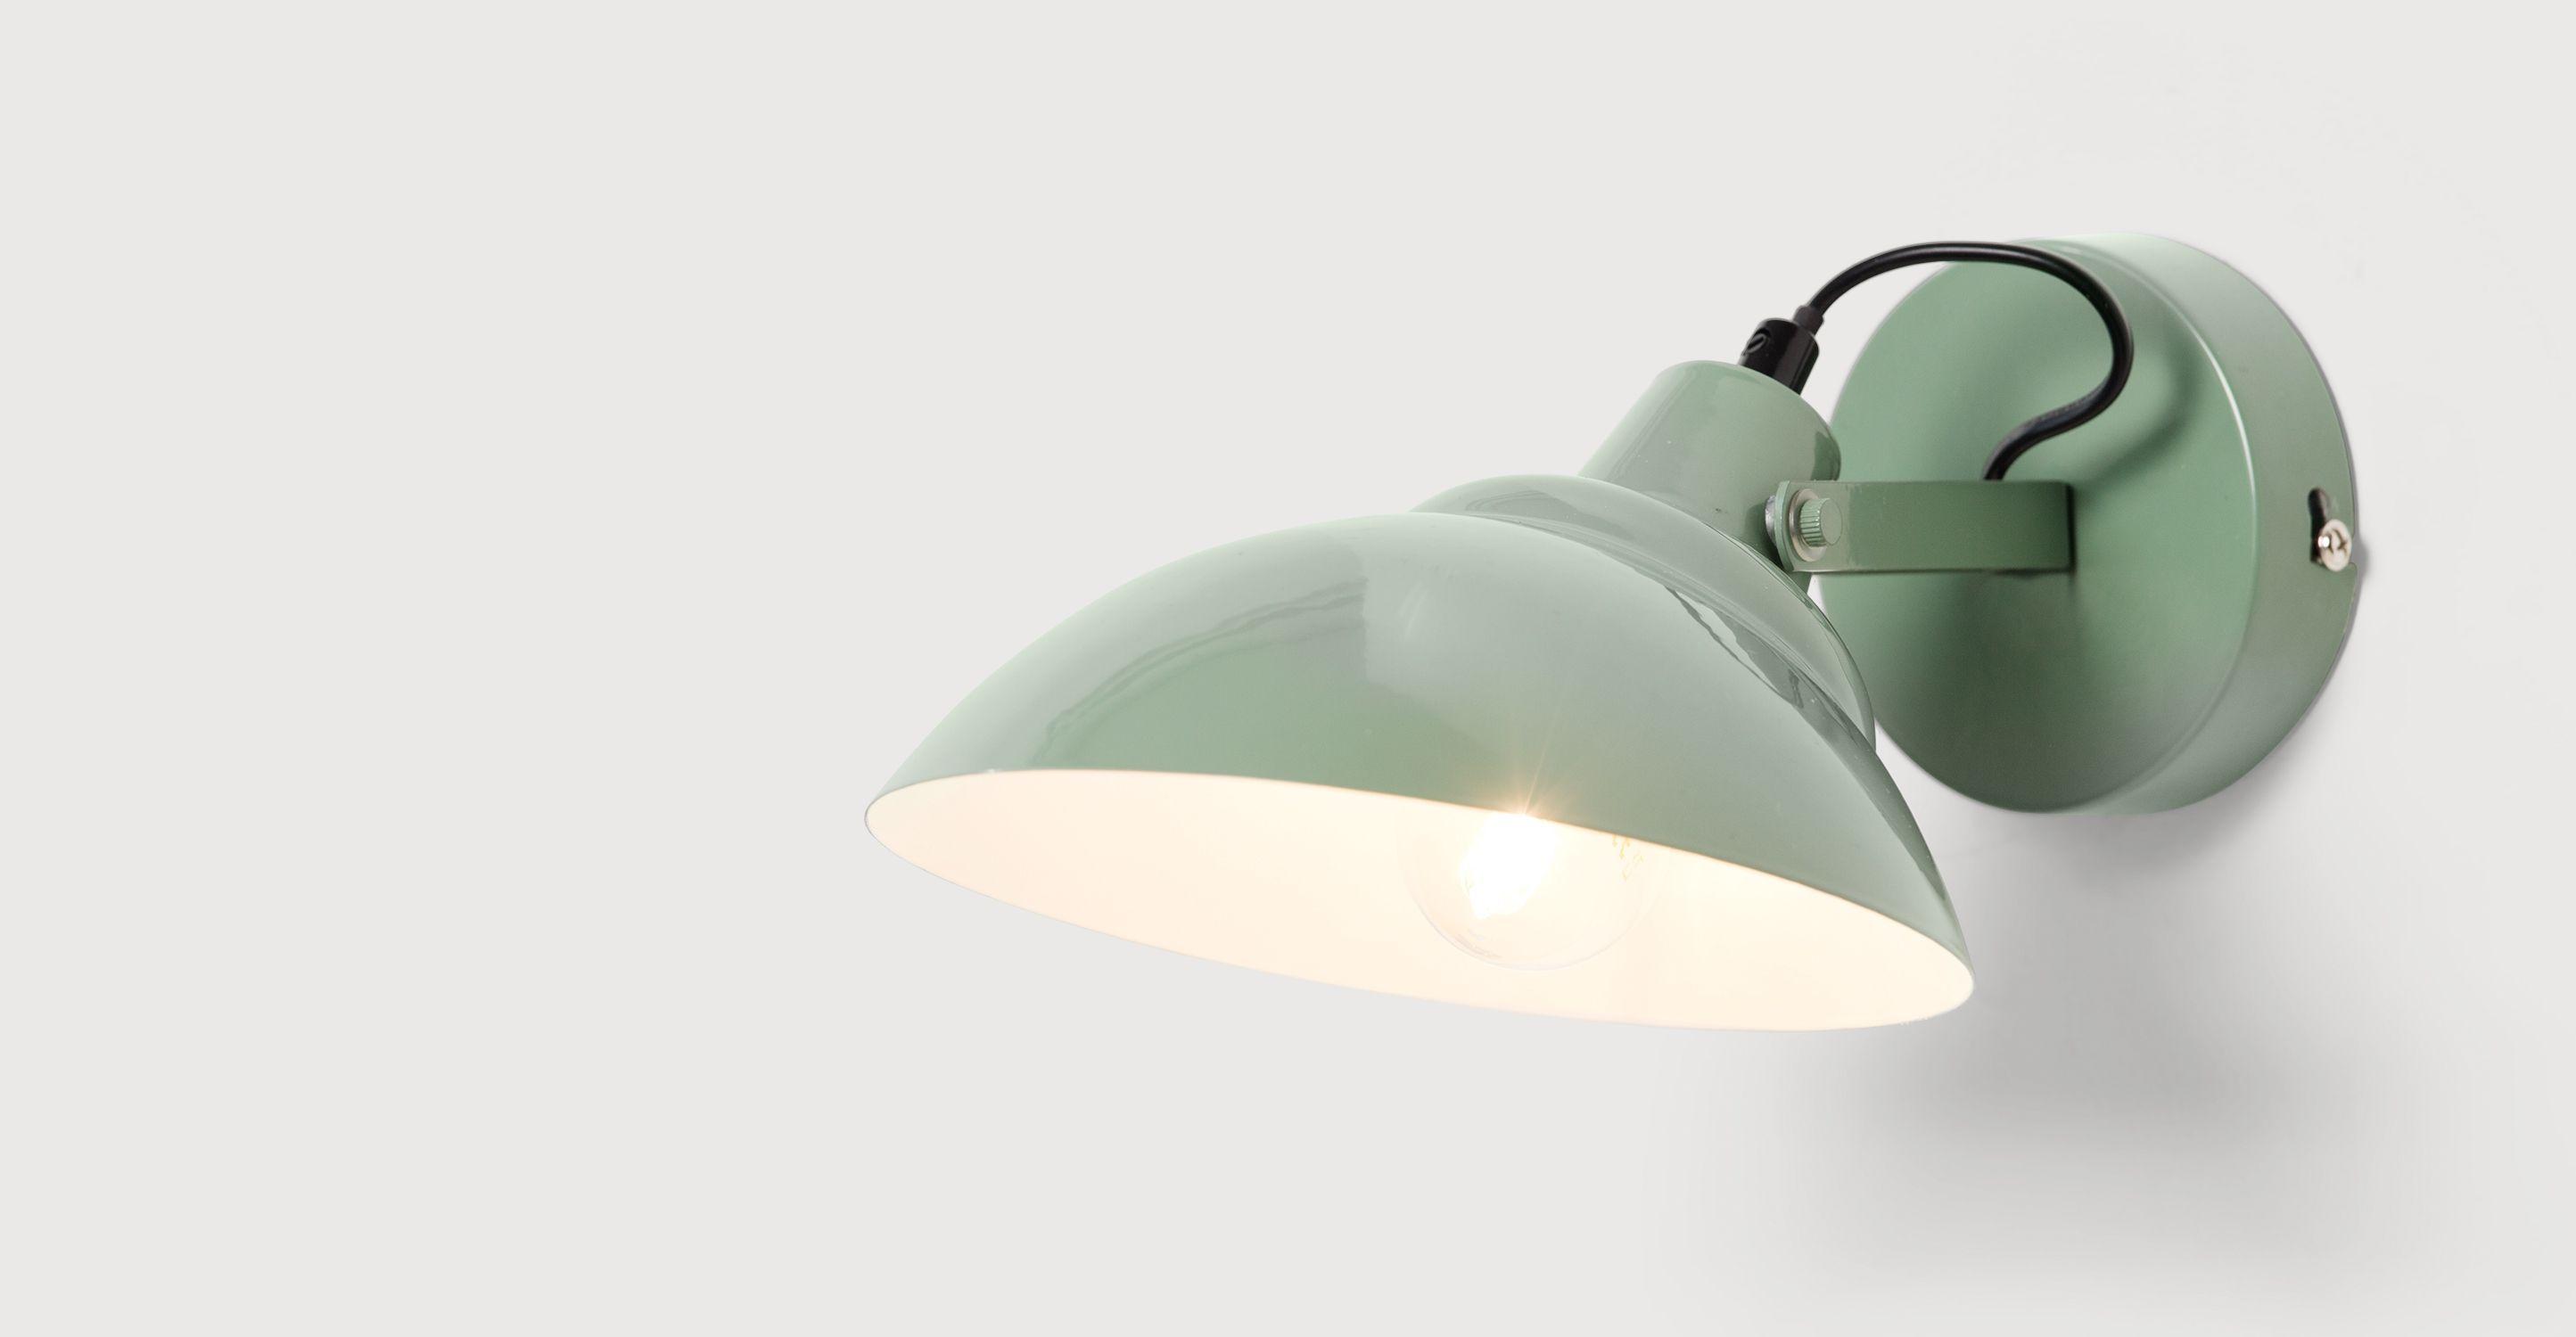 Badezimmer Wandleuchten ~ Avery wandleuchte moosgrün lampe küche leuchten und badezimmer